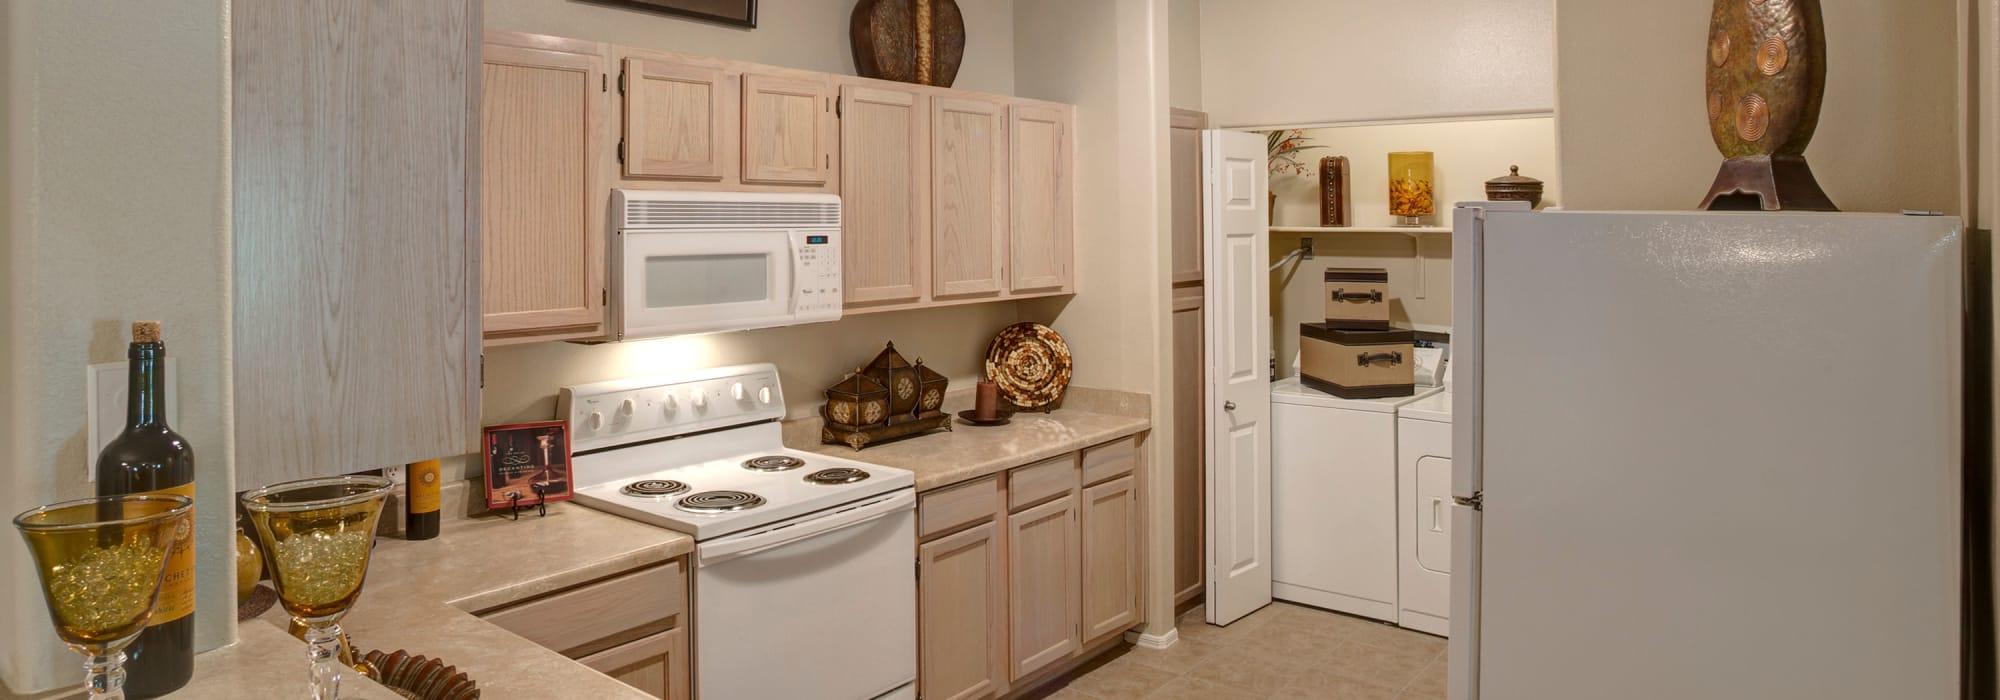 Spacious kitchen at The Regents at Scottsdale in Scottsdale, Arizona